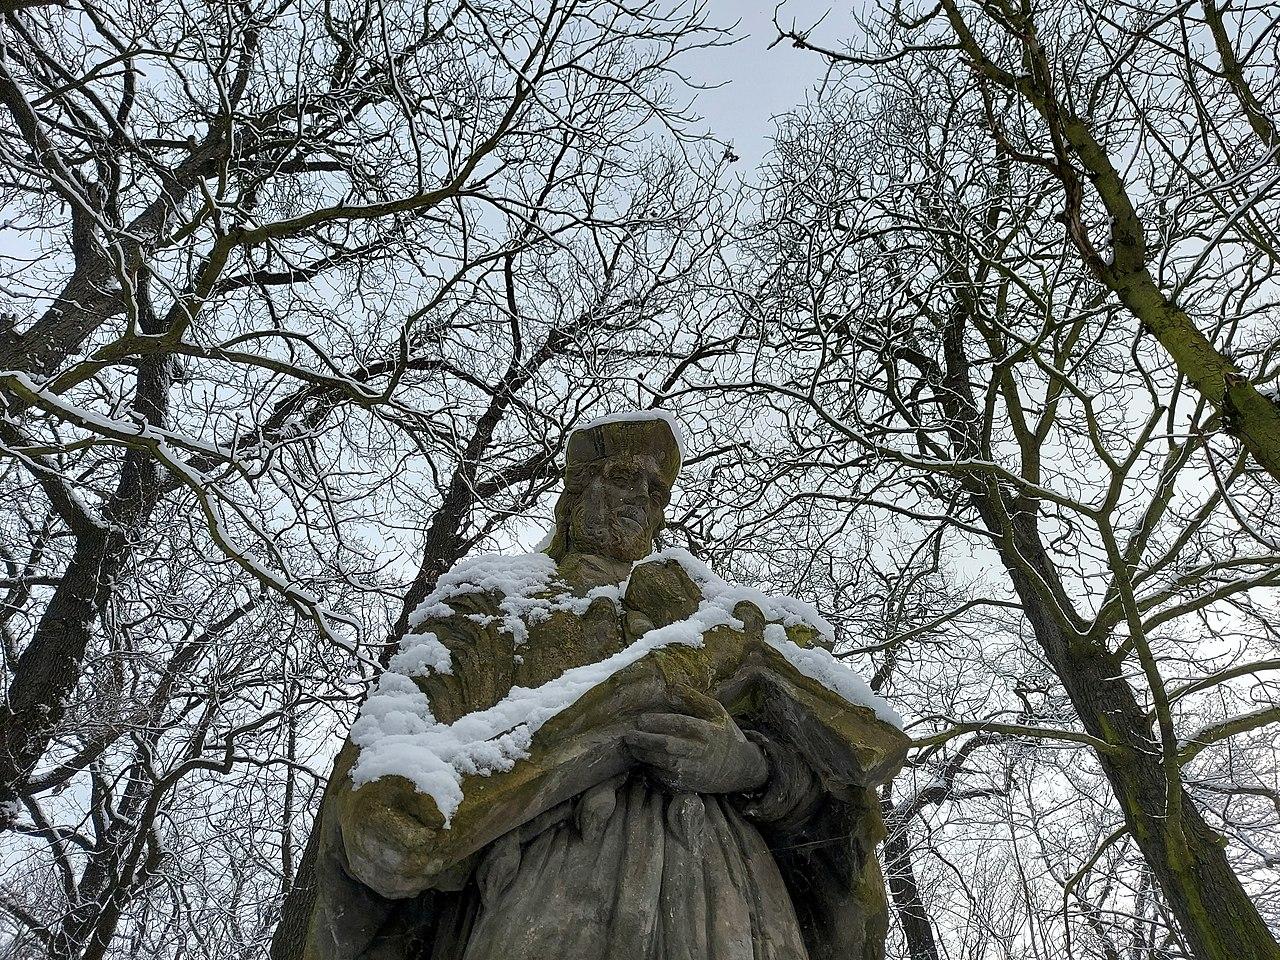 Statue of Jan Nepomuk in park Kosire, Prague - 20210126.jpg